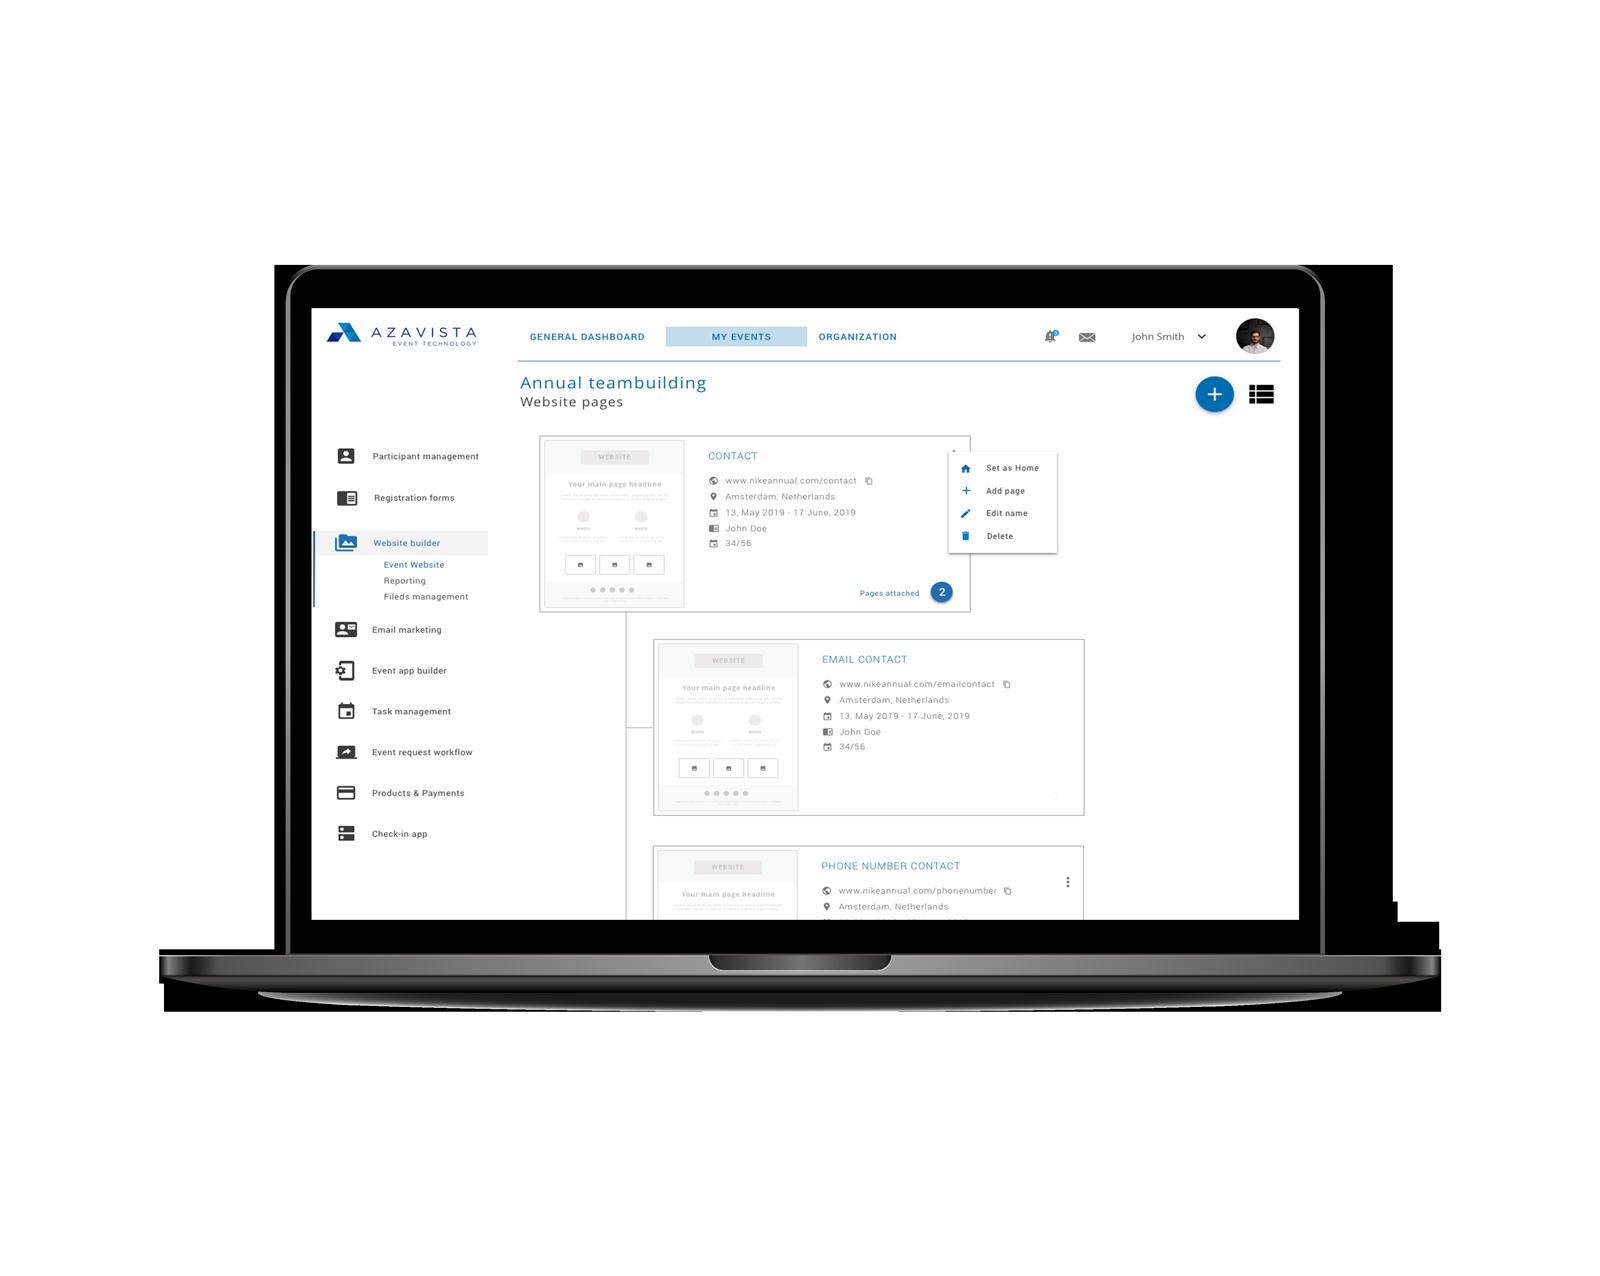 website-content-management-1.png